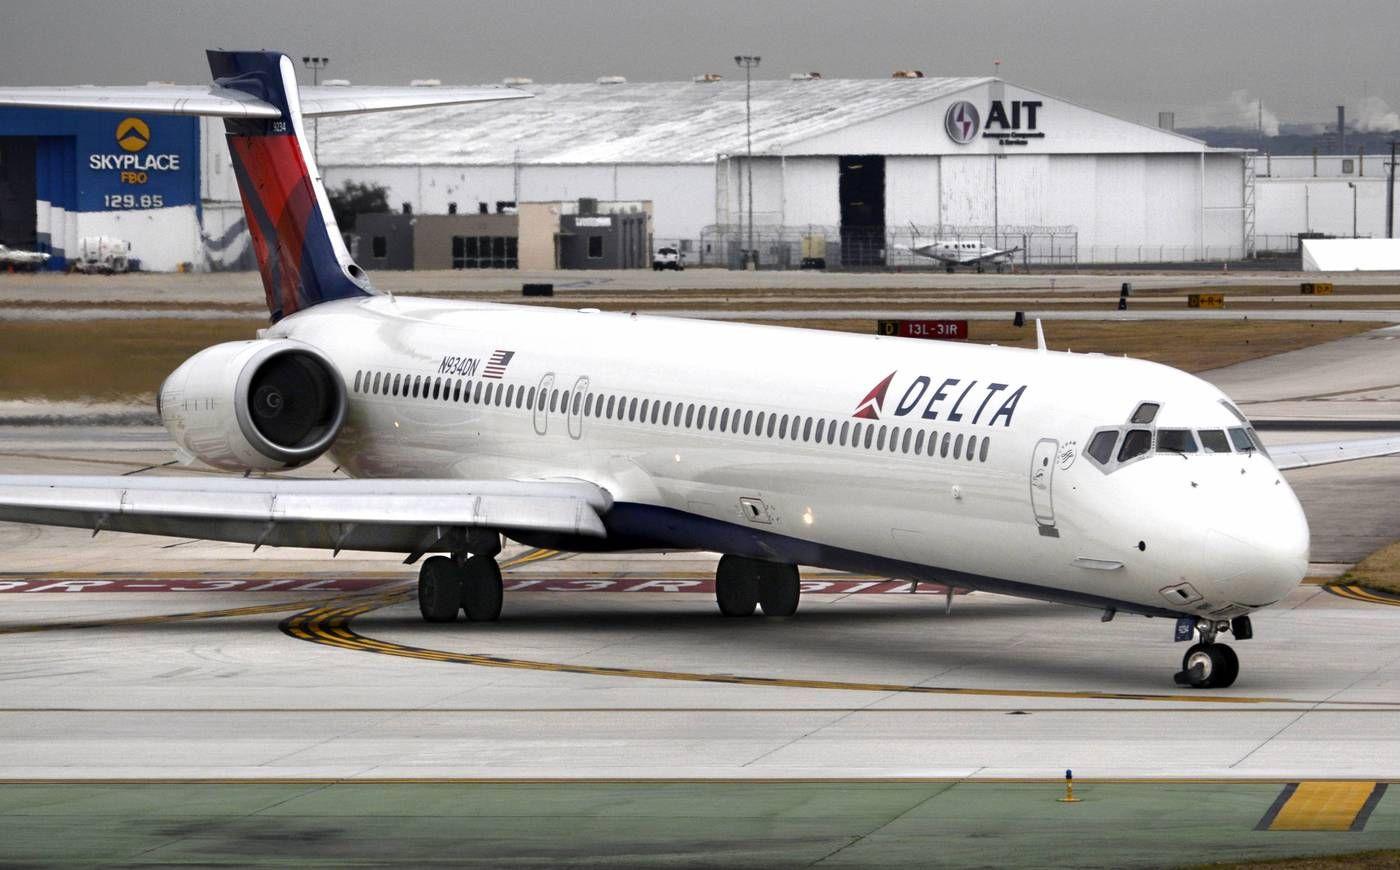 Delta Airlines Pulls 'Creepy' Diet Coke InFlight Napkins